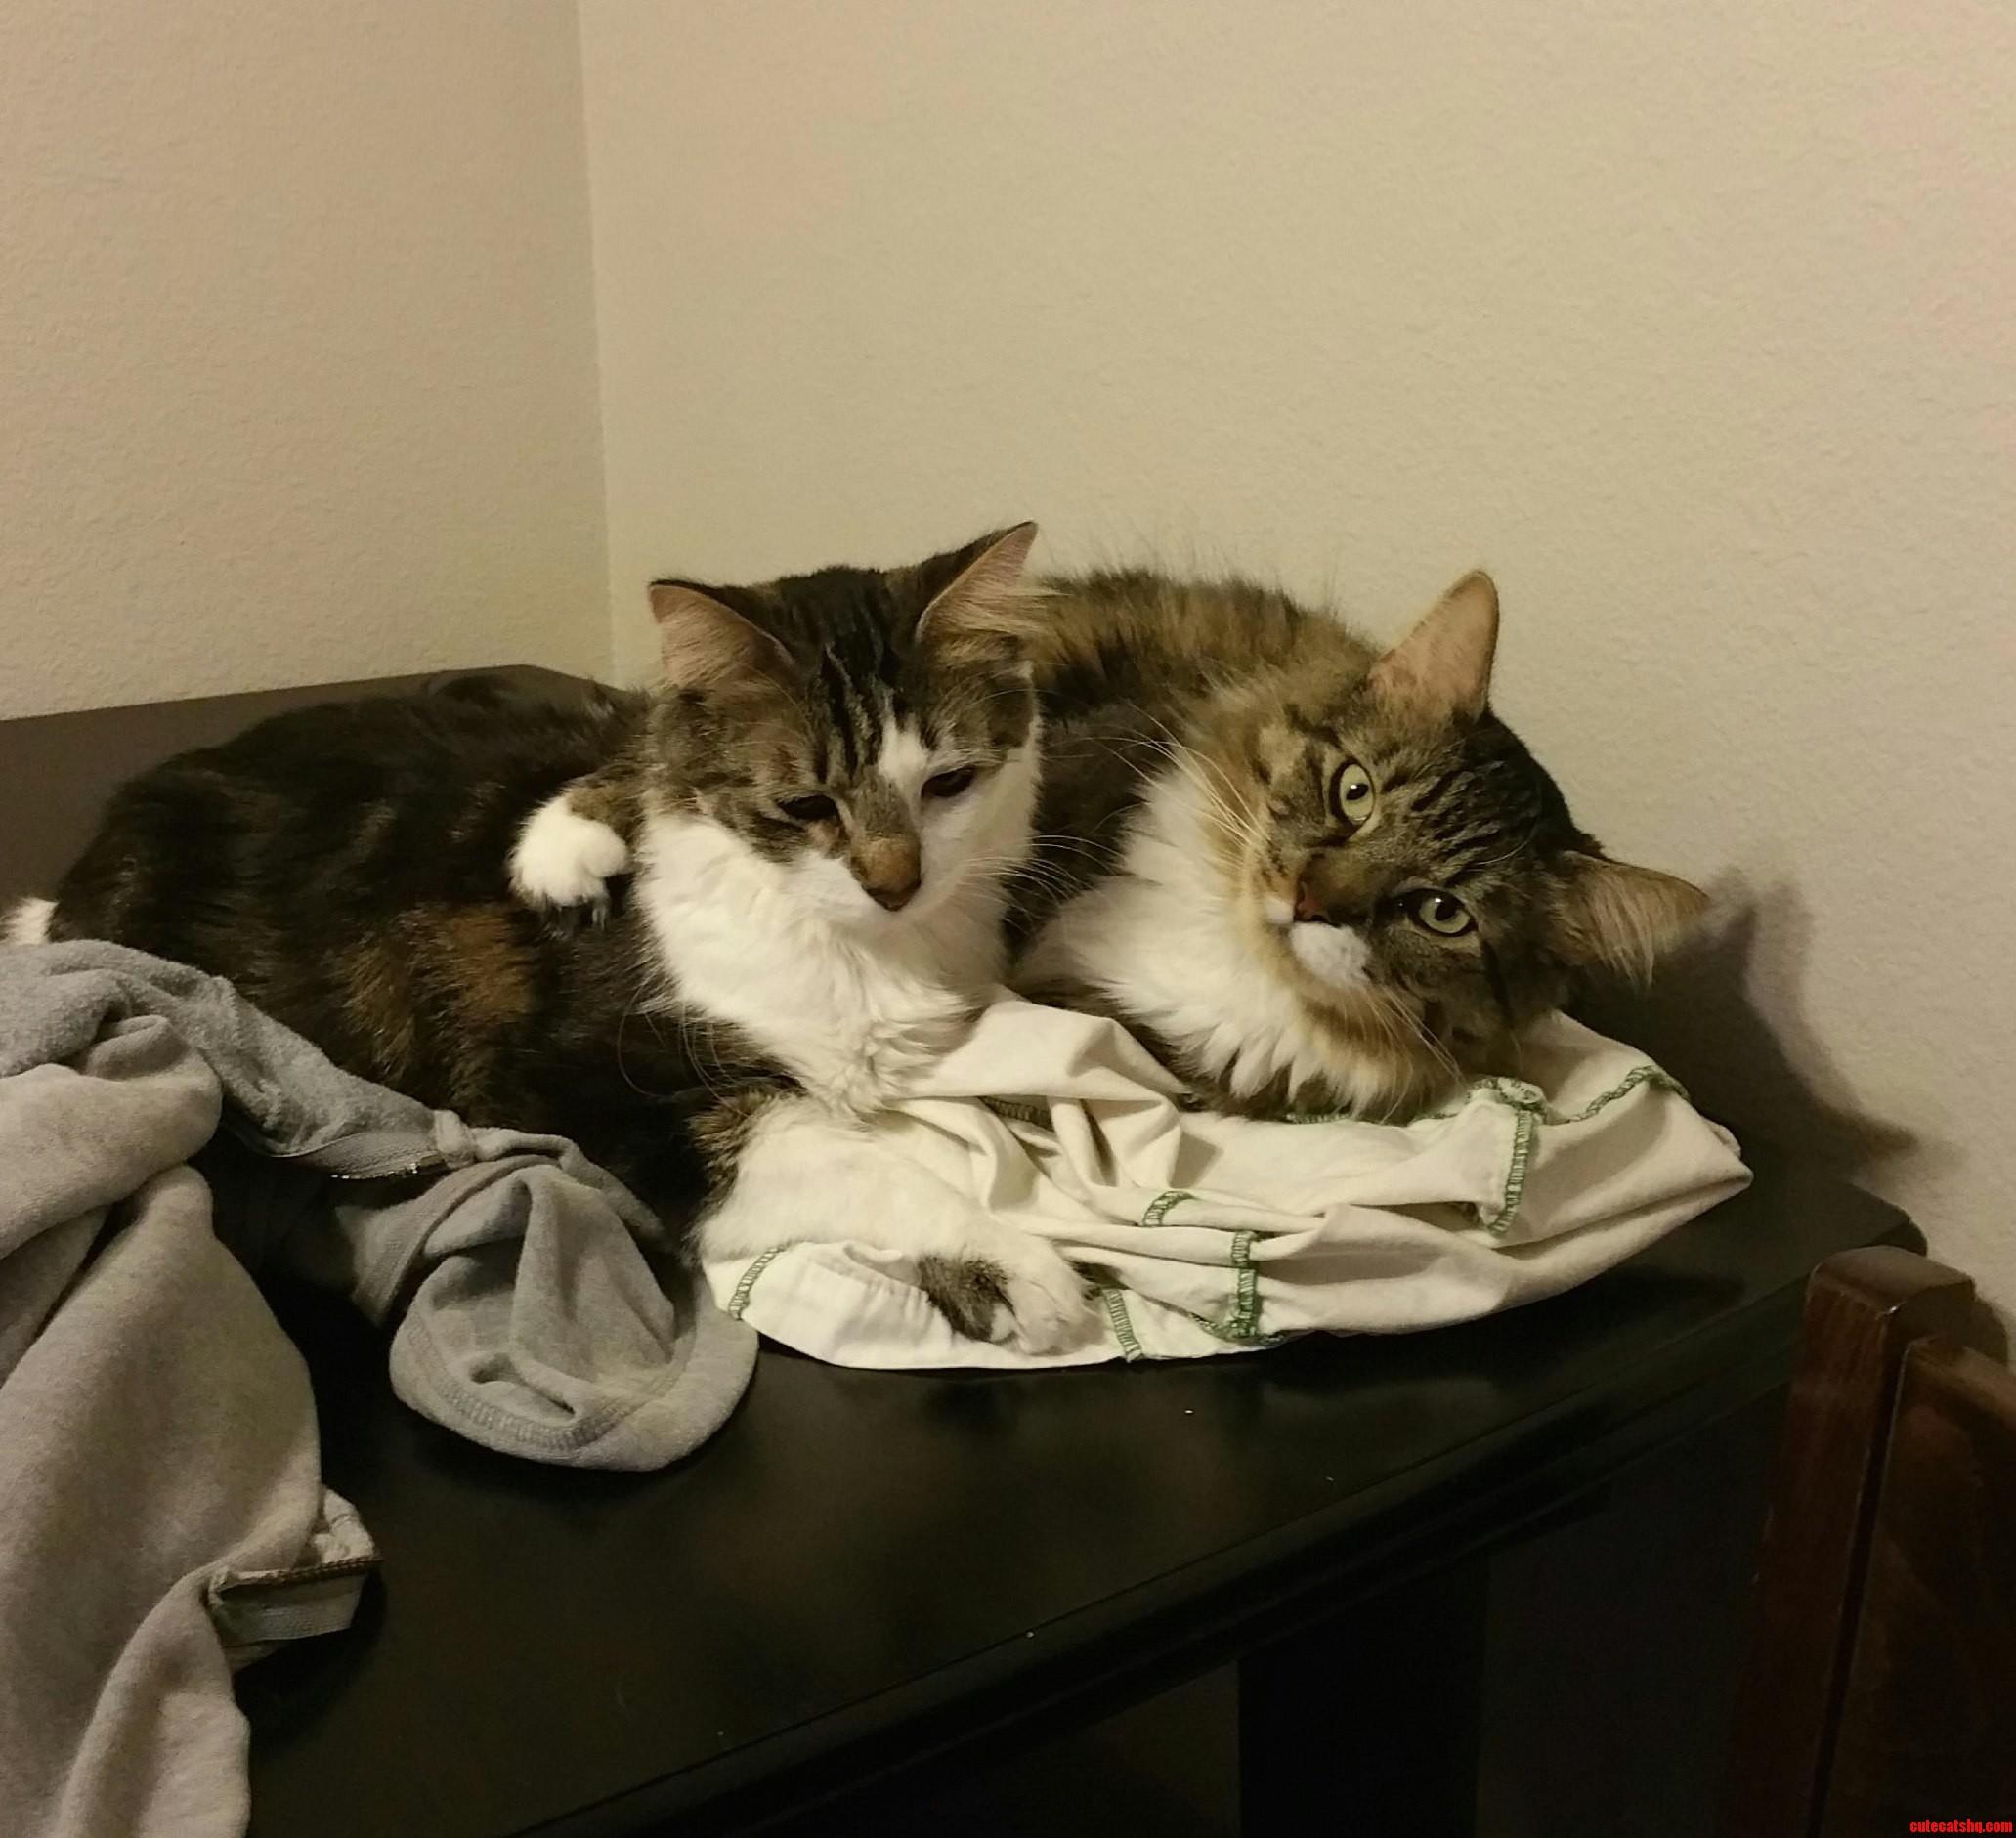 My cuddly kitties